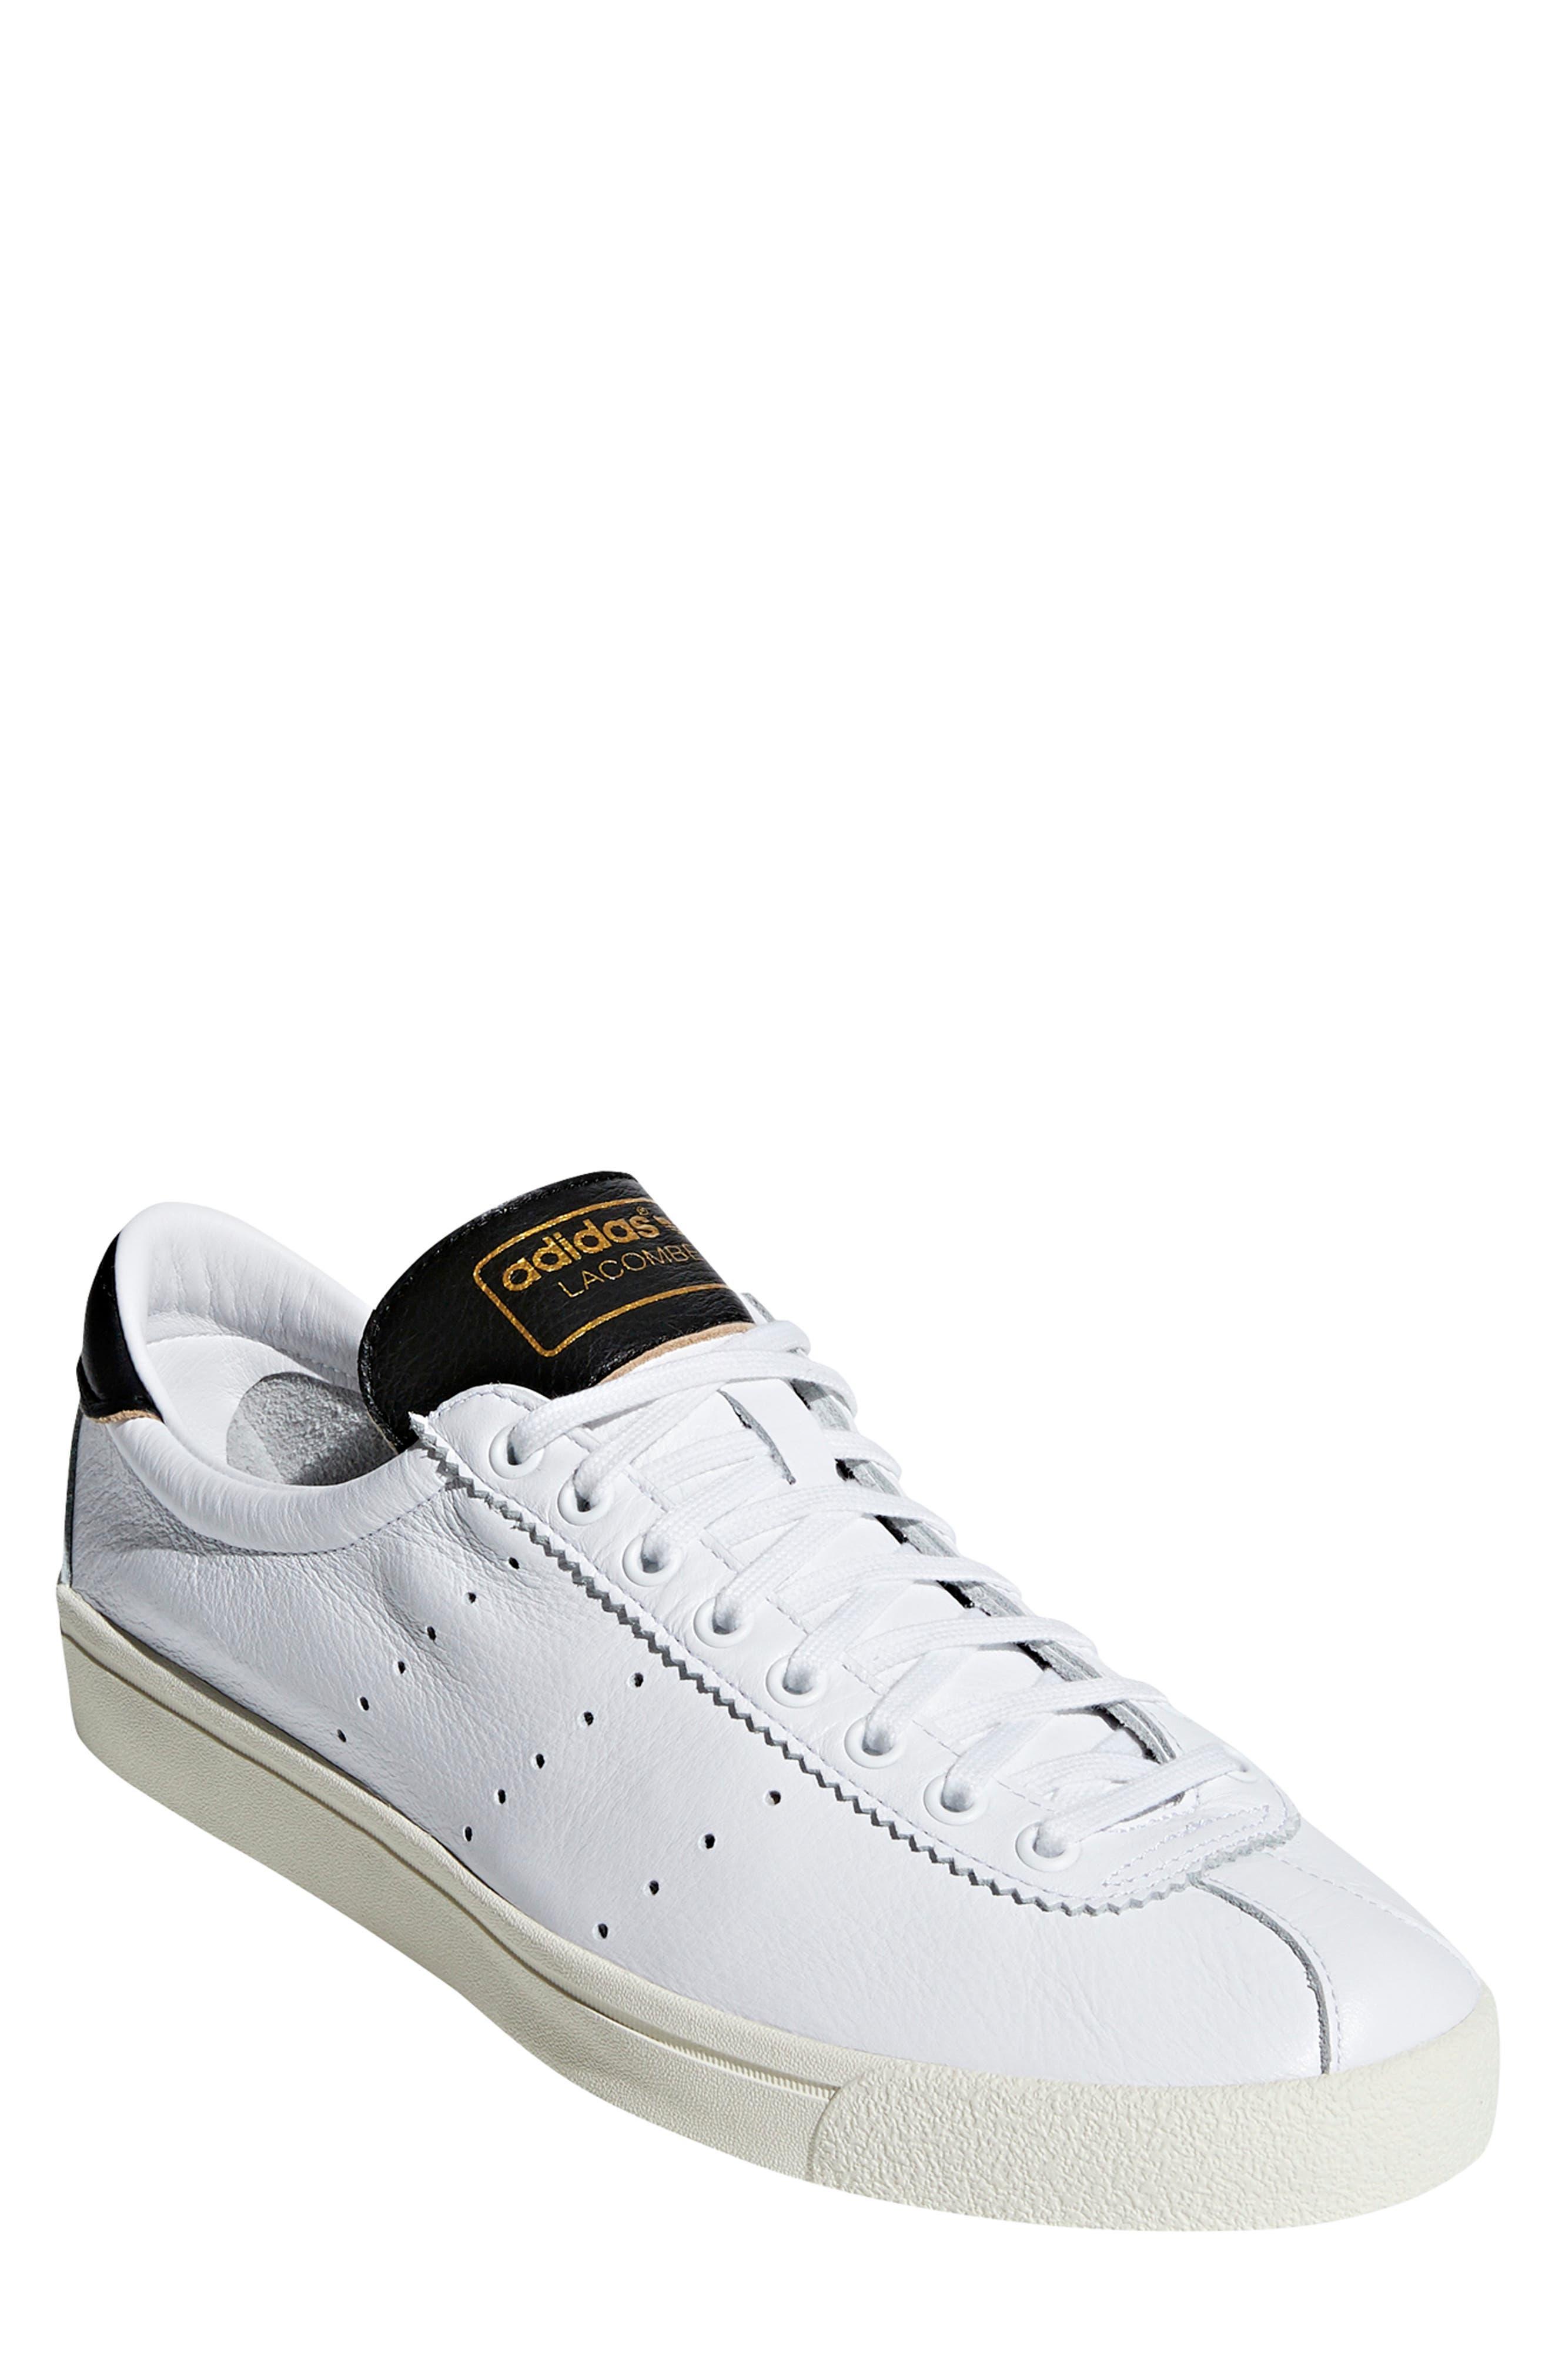 adidas Lacombe Sneaker (Men) | Nordstrom